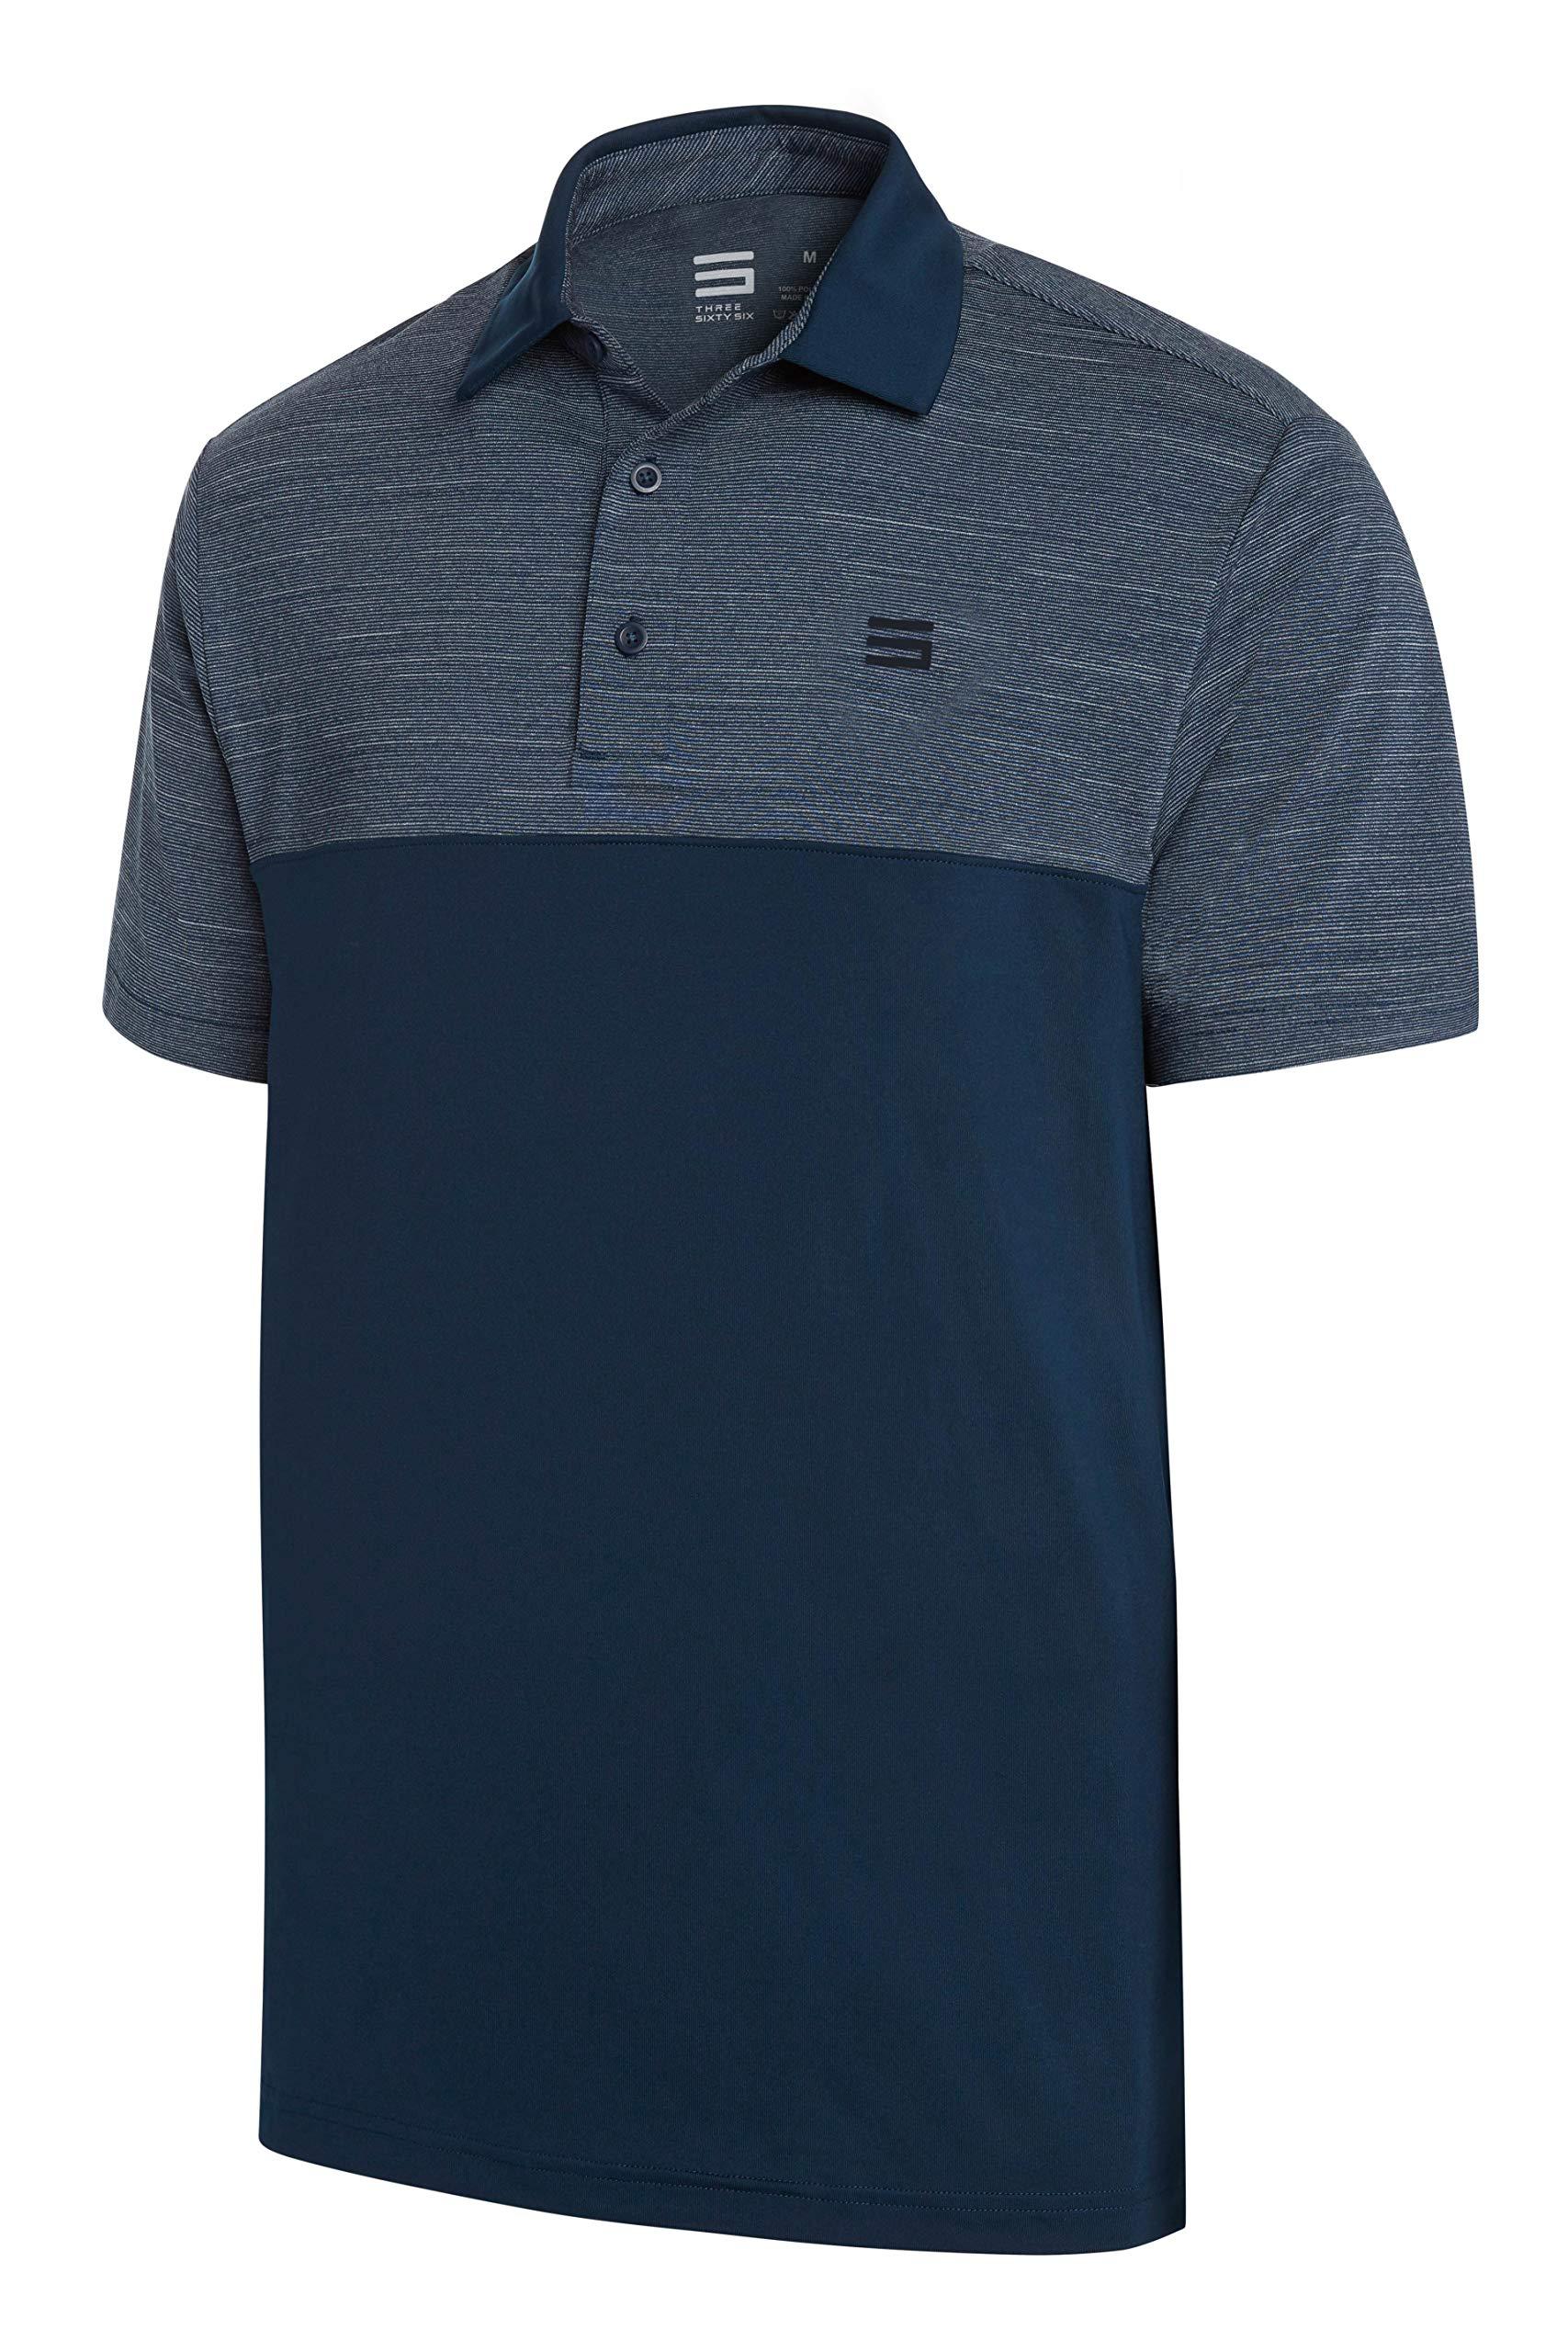 Three Sixty Six Dri-Fit Golf Shirts for Men - Moisture Wicking Short-Sleeve Polo Shirt Midnight Blue by Three Sixty Six